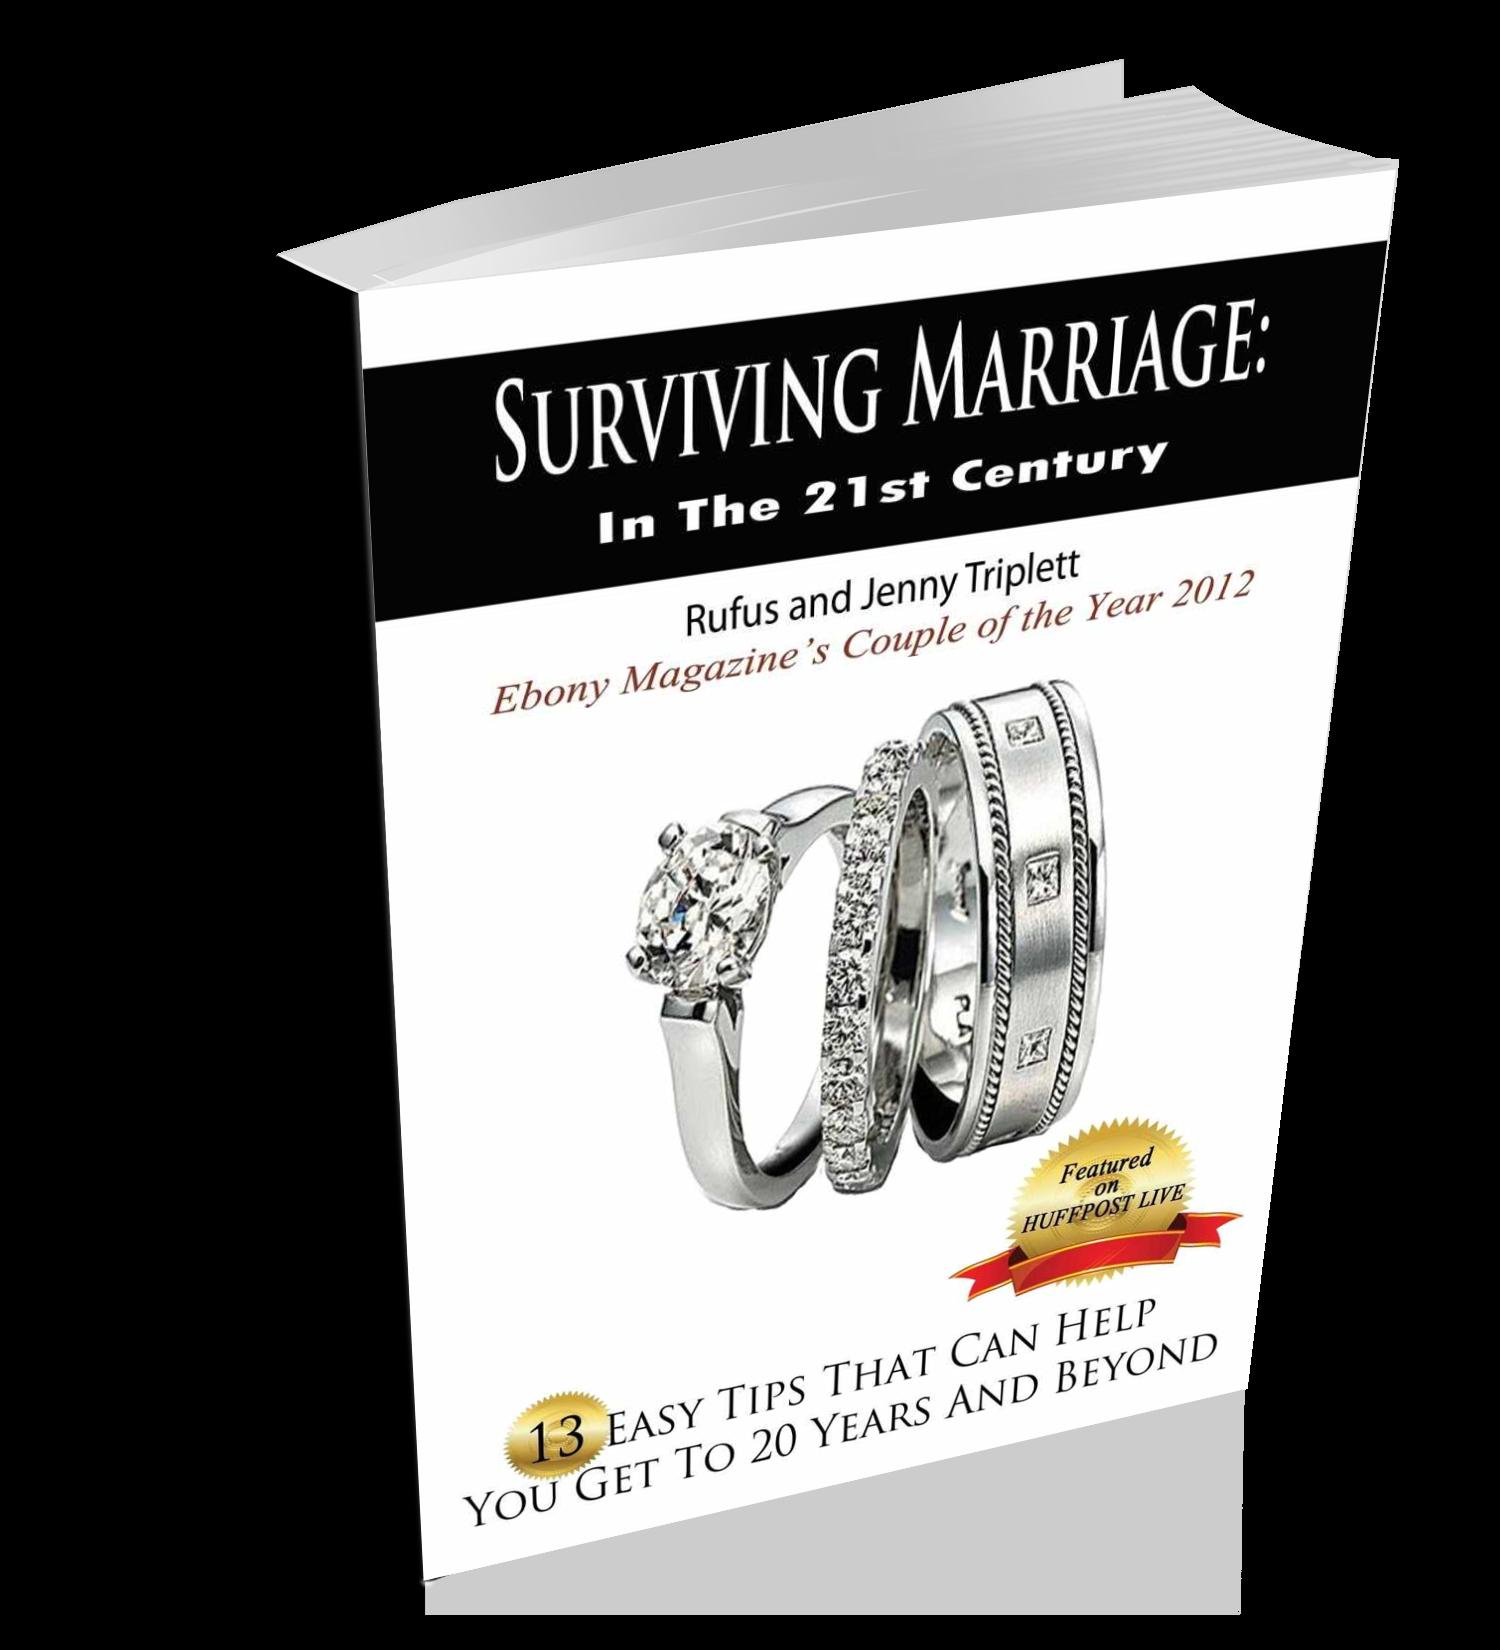 Surviving Marriage Tips book on Survivig Marriage.com, surviving marriage in the 21st century